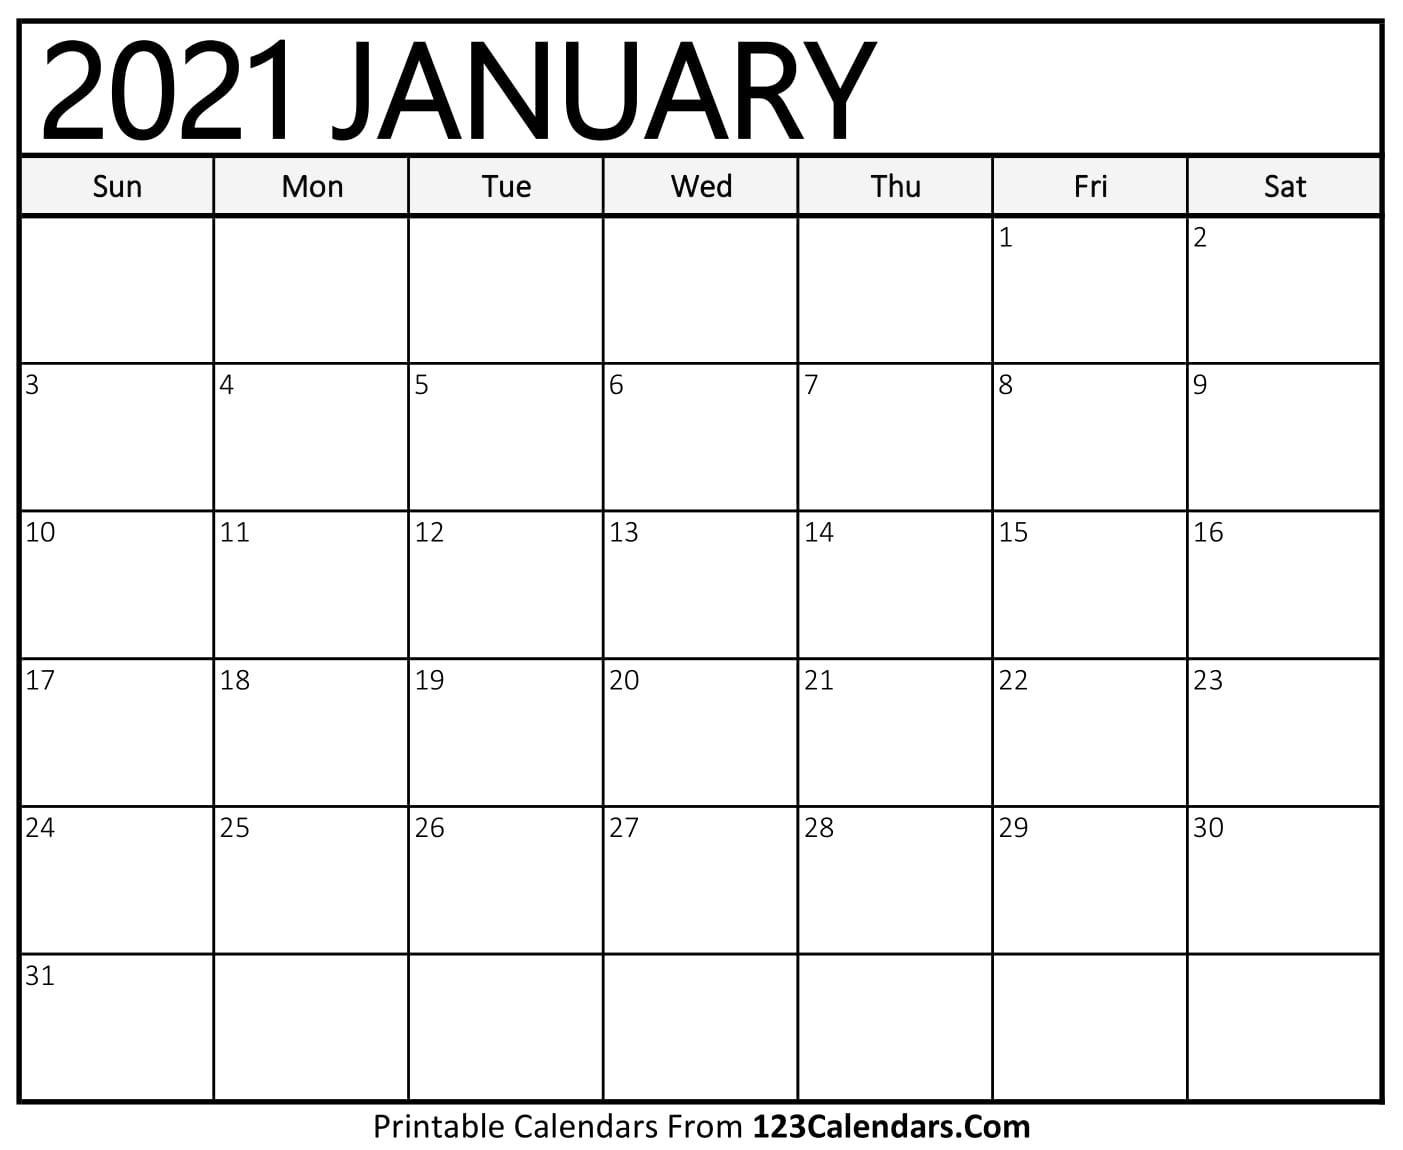 Free Printable Family Calendar 2021 | Free 2021 Printable